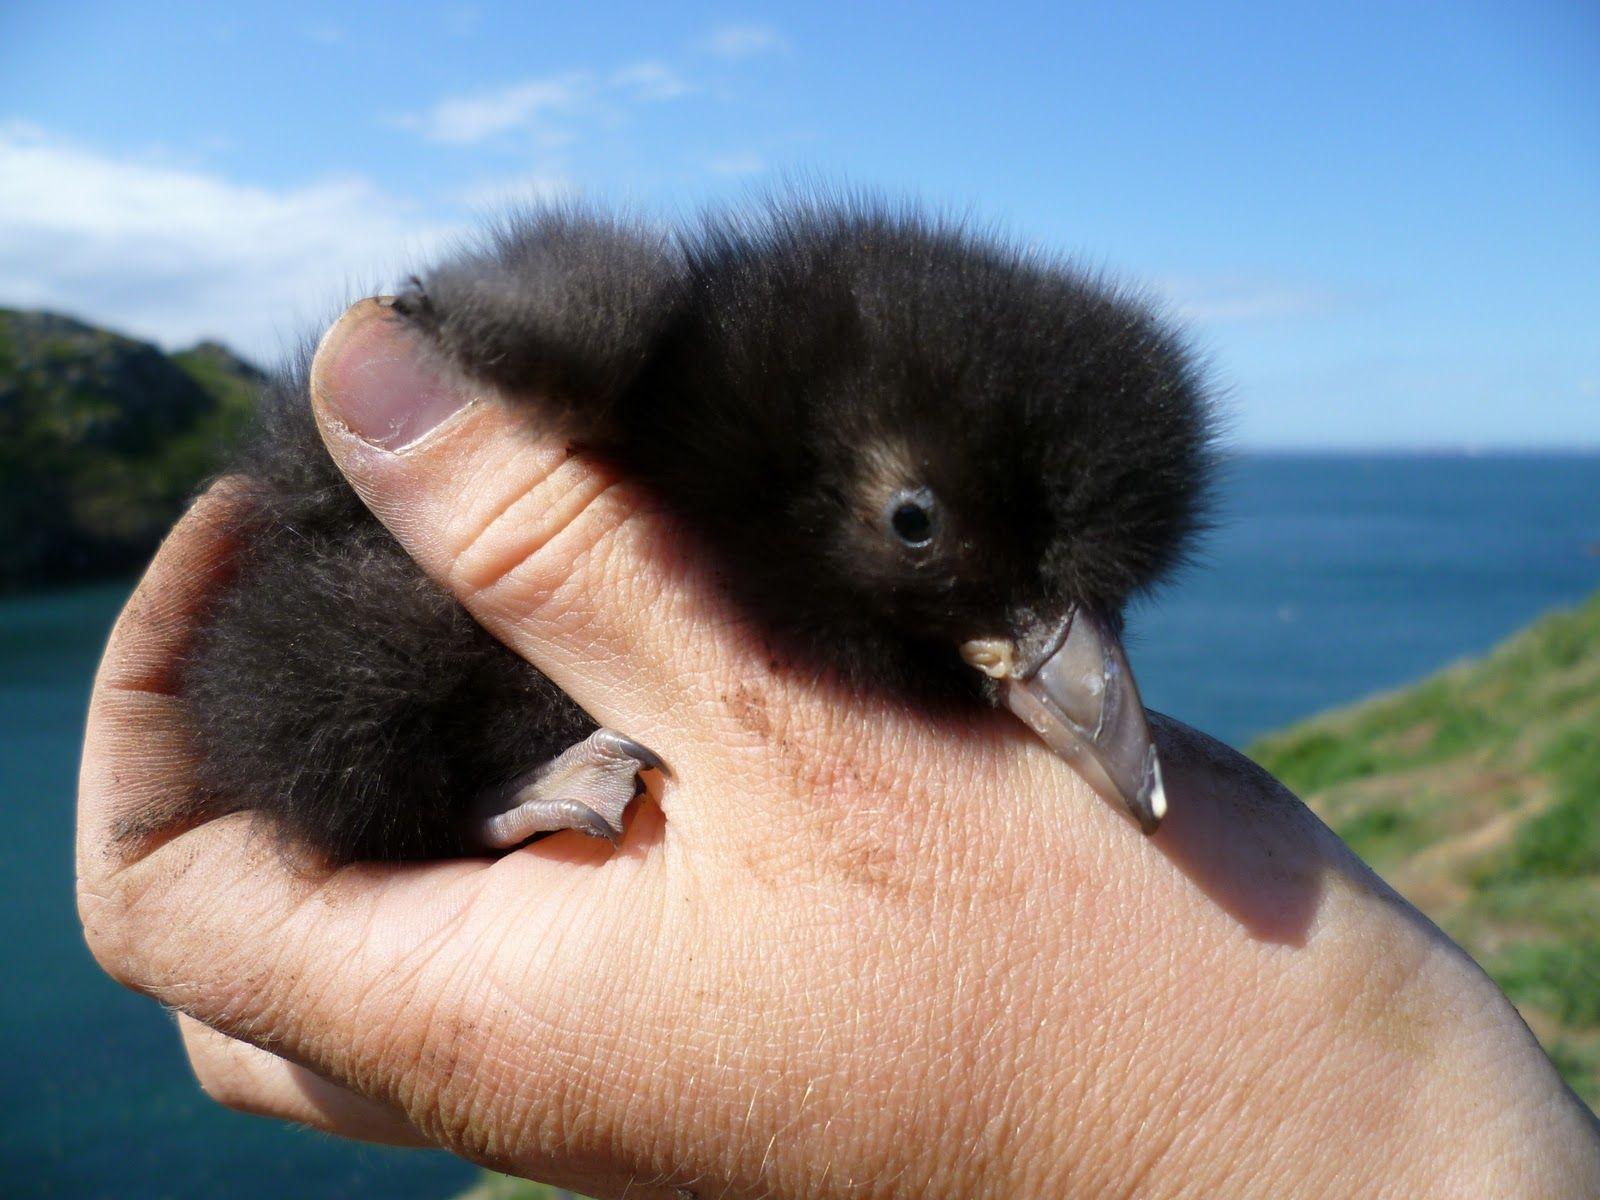 A Baby Puffin is called Puffling | Birds, Puffins bird